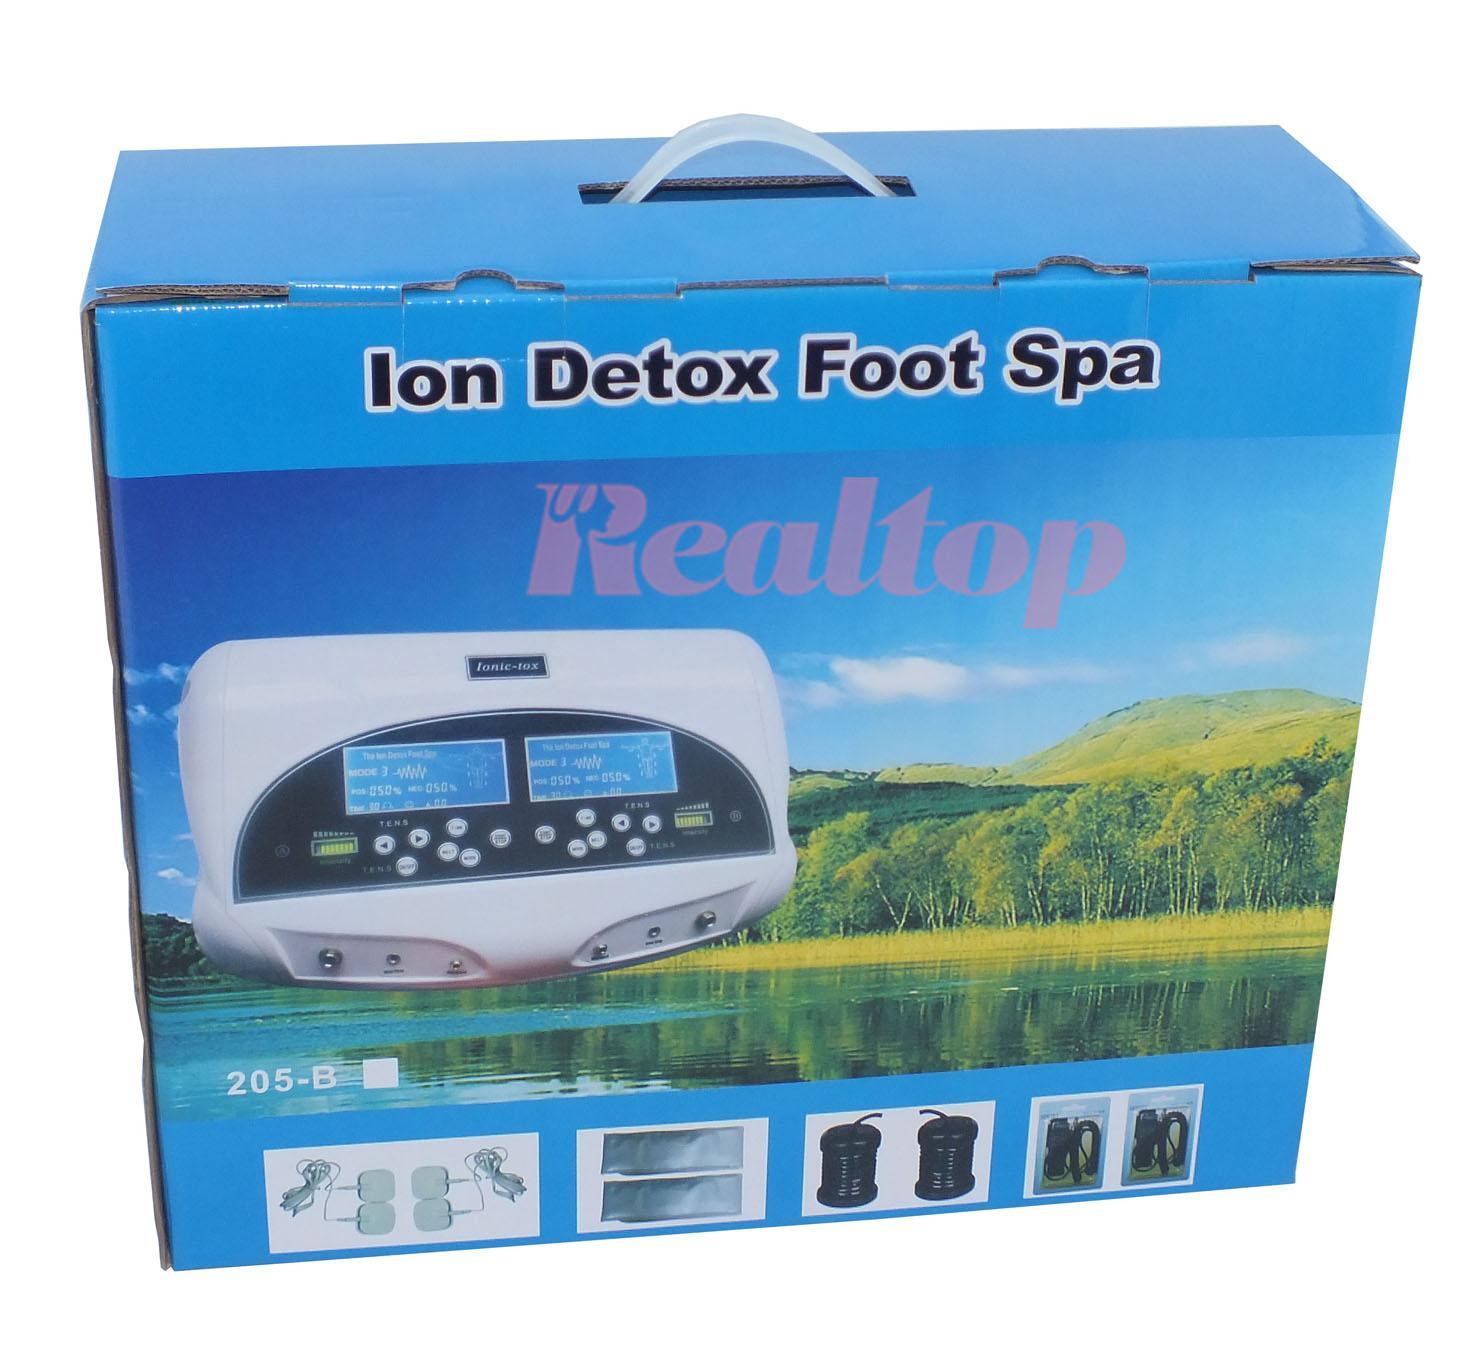 foot detox machine review